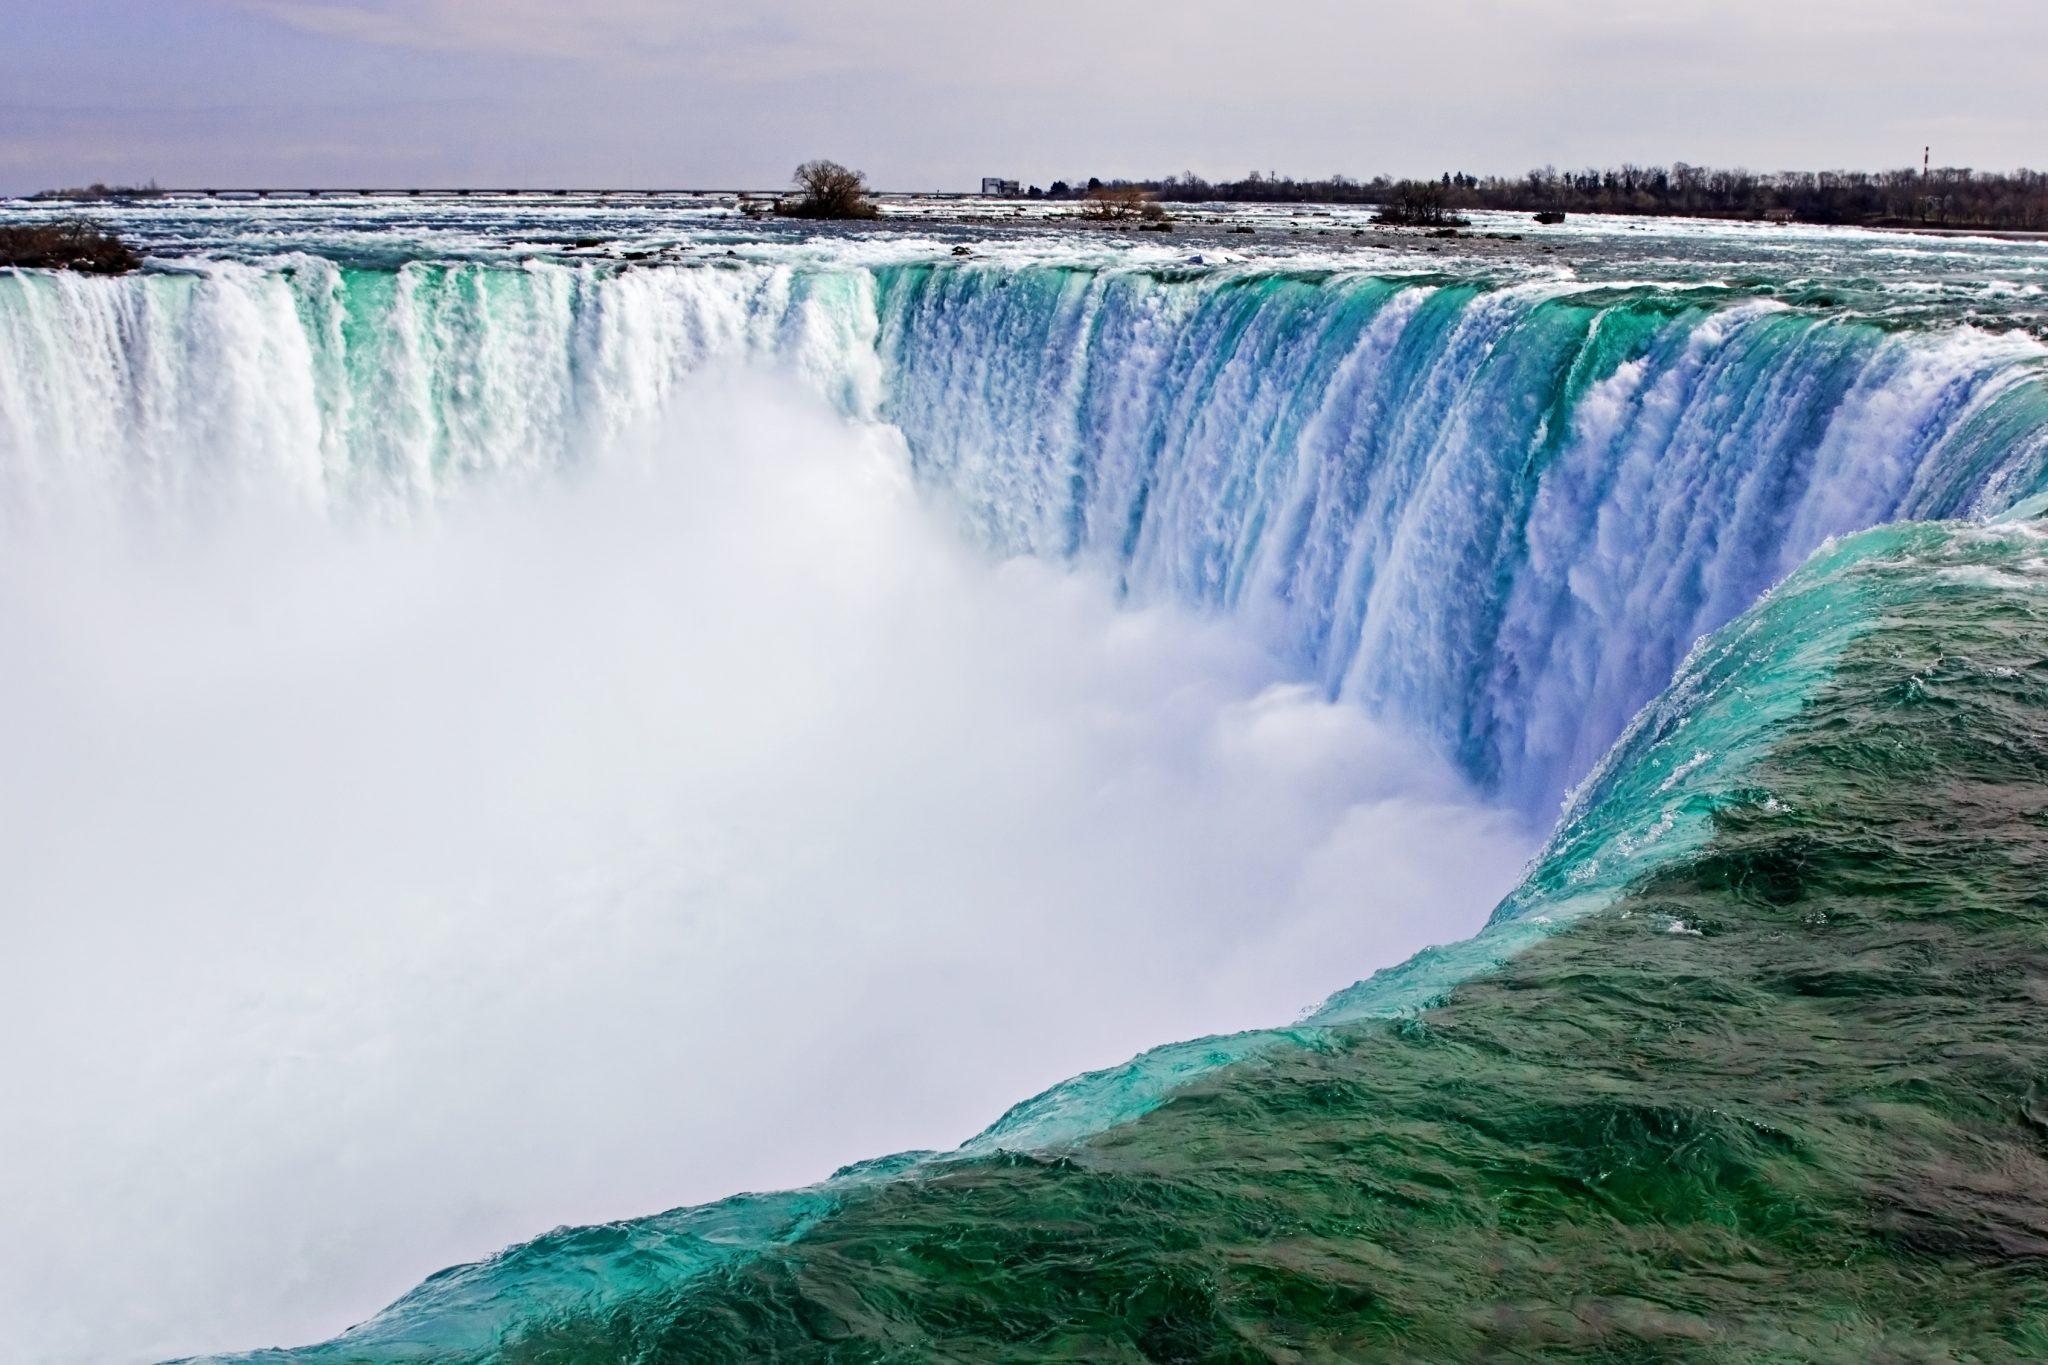 Top of the Horseshoe Falls at Niagara Falls